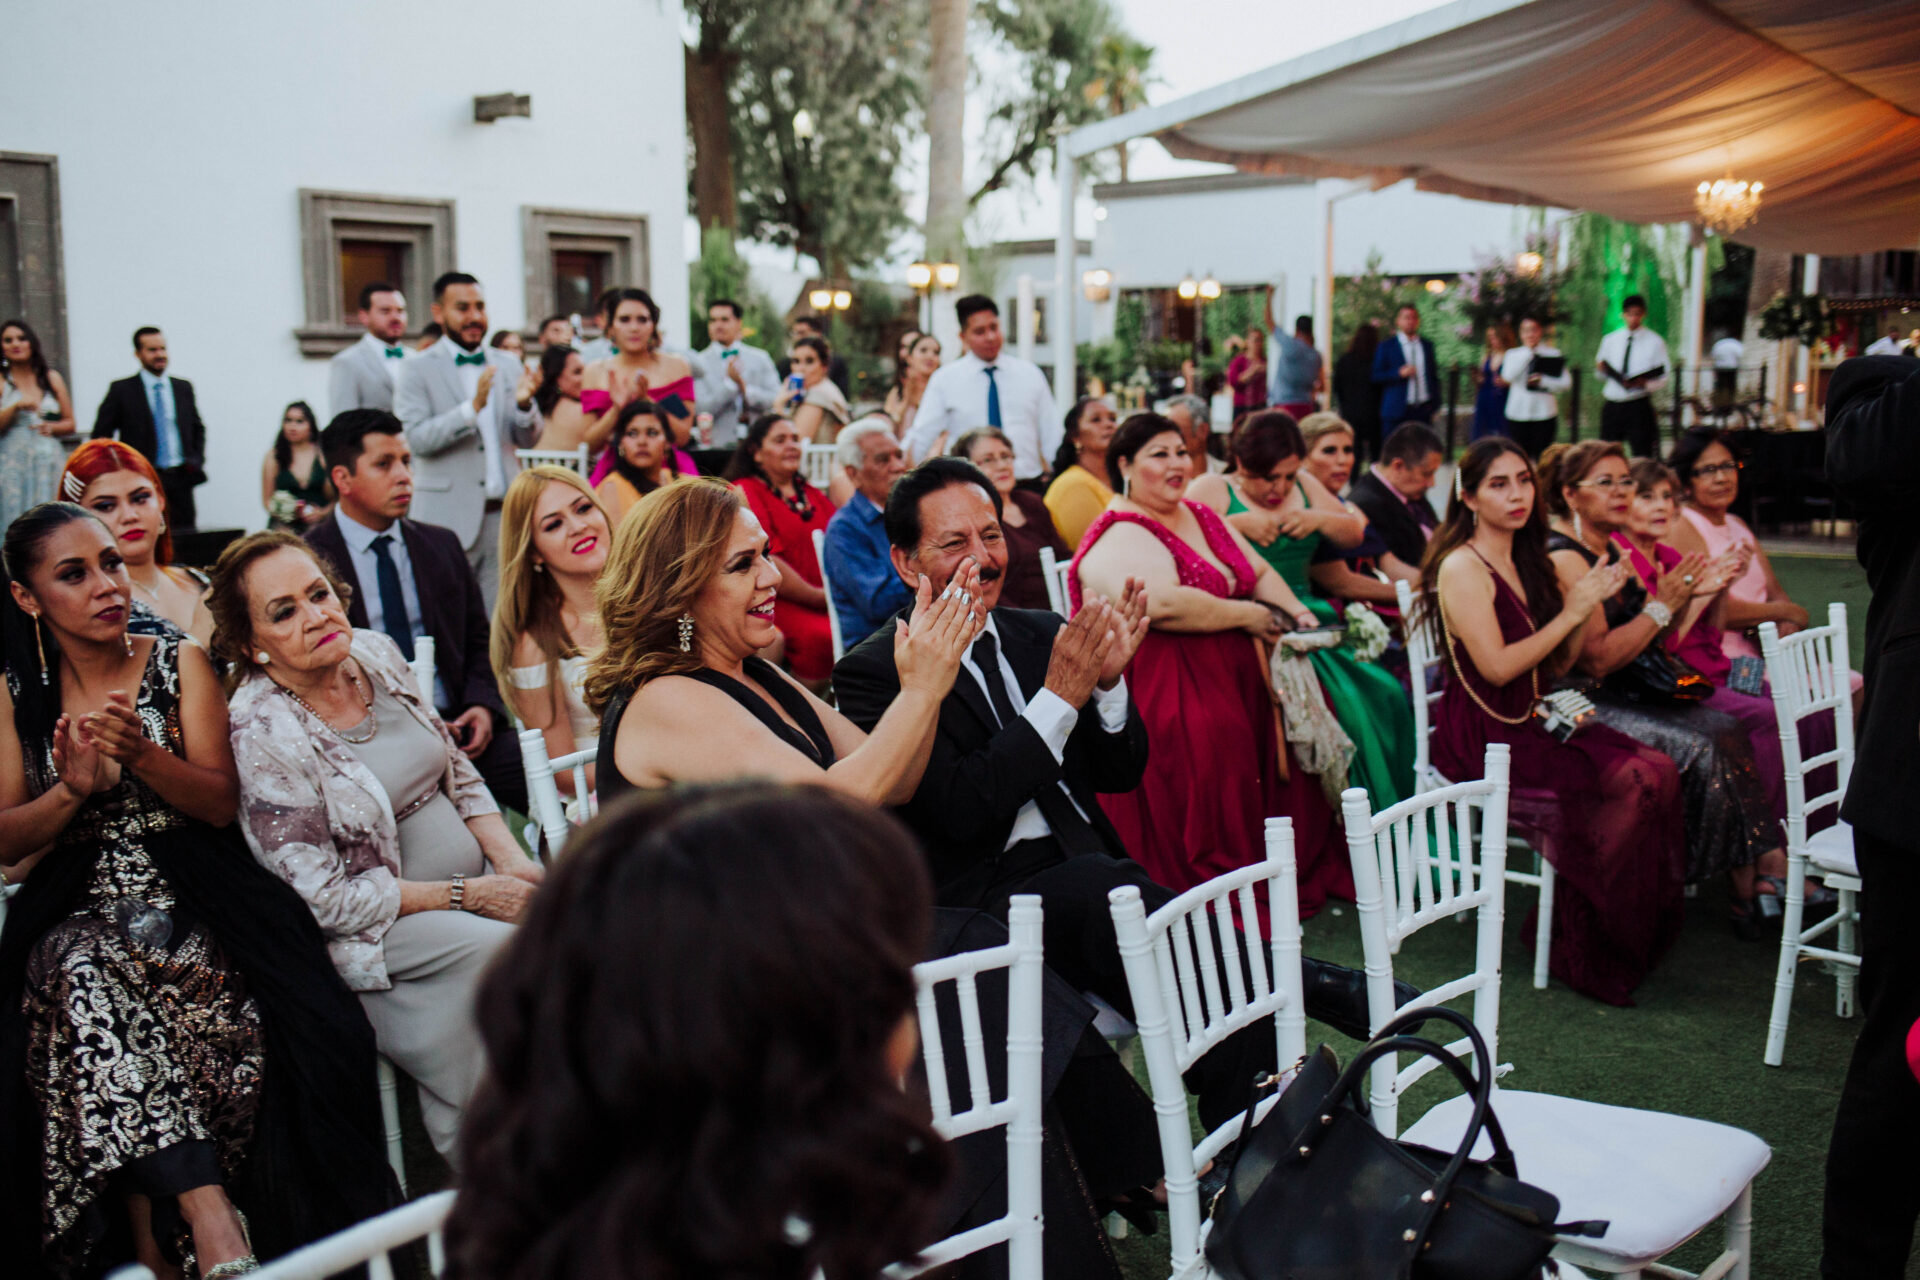 javier_noriega_fotografo_bodas_torreon_coahuila_zacatecas_wedding_photographer39a